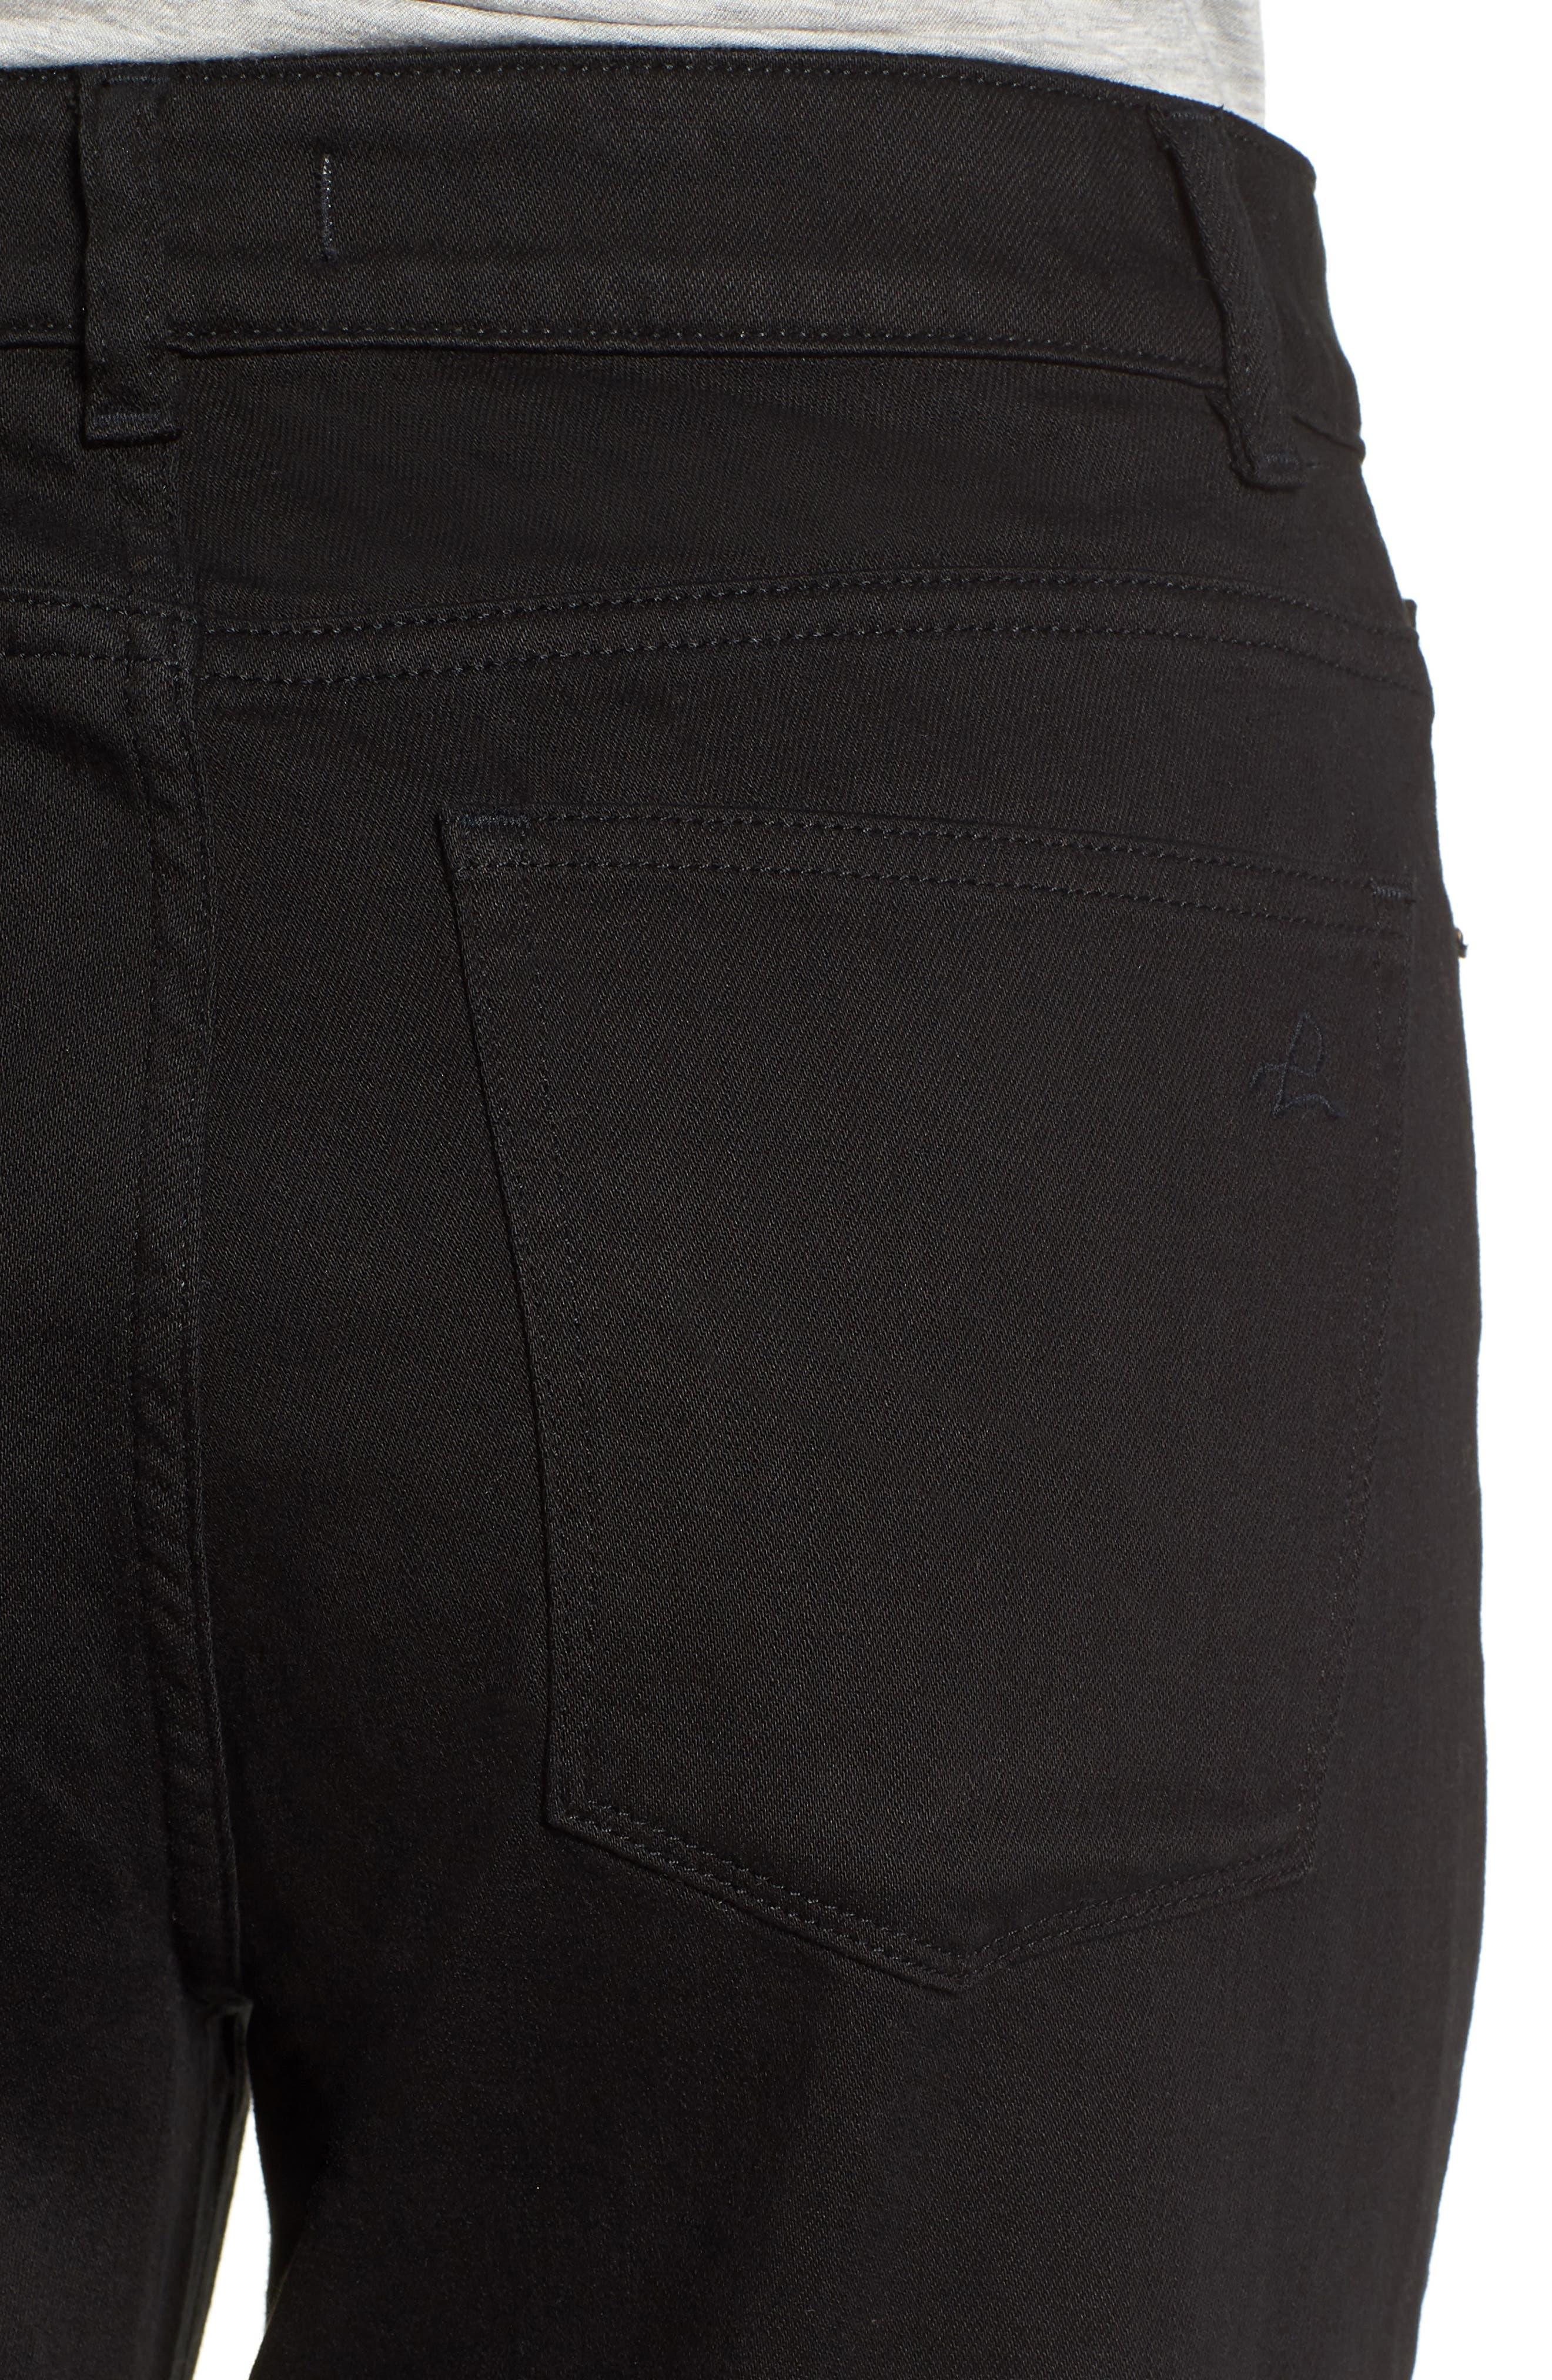 Hepburn High Waist Raw Hem Wide Leg Jeans,                             Alternate thumbnail 4, color,                             001